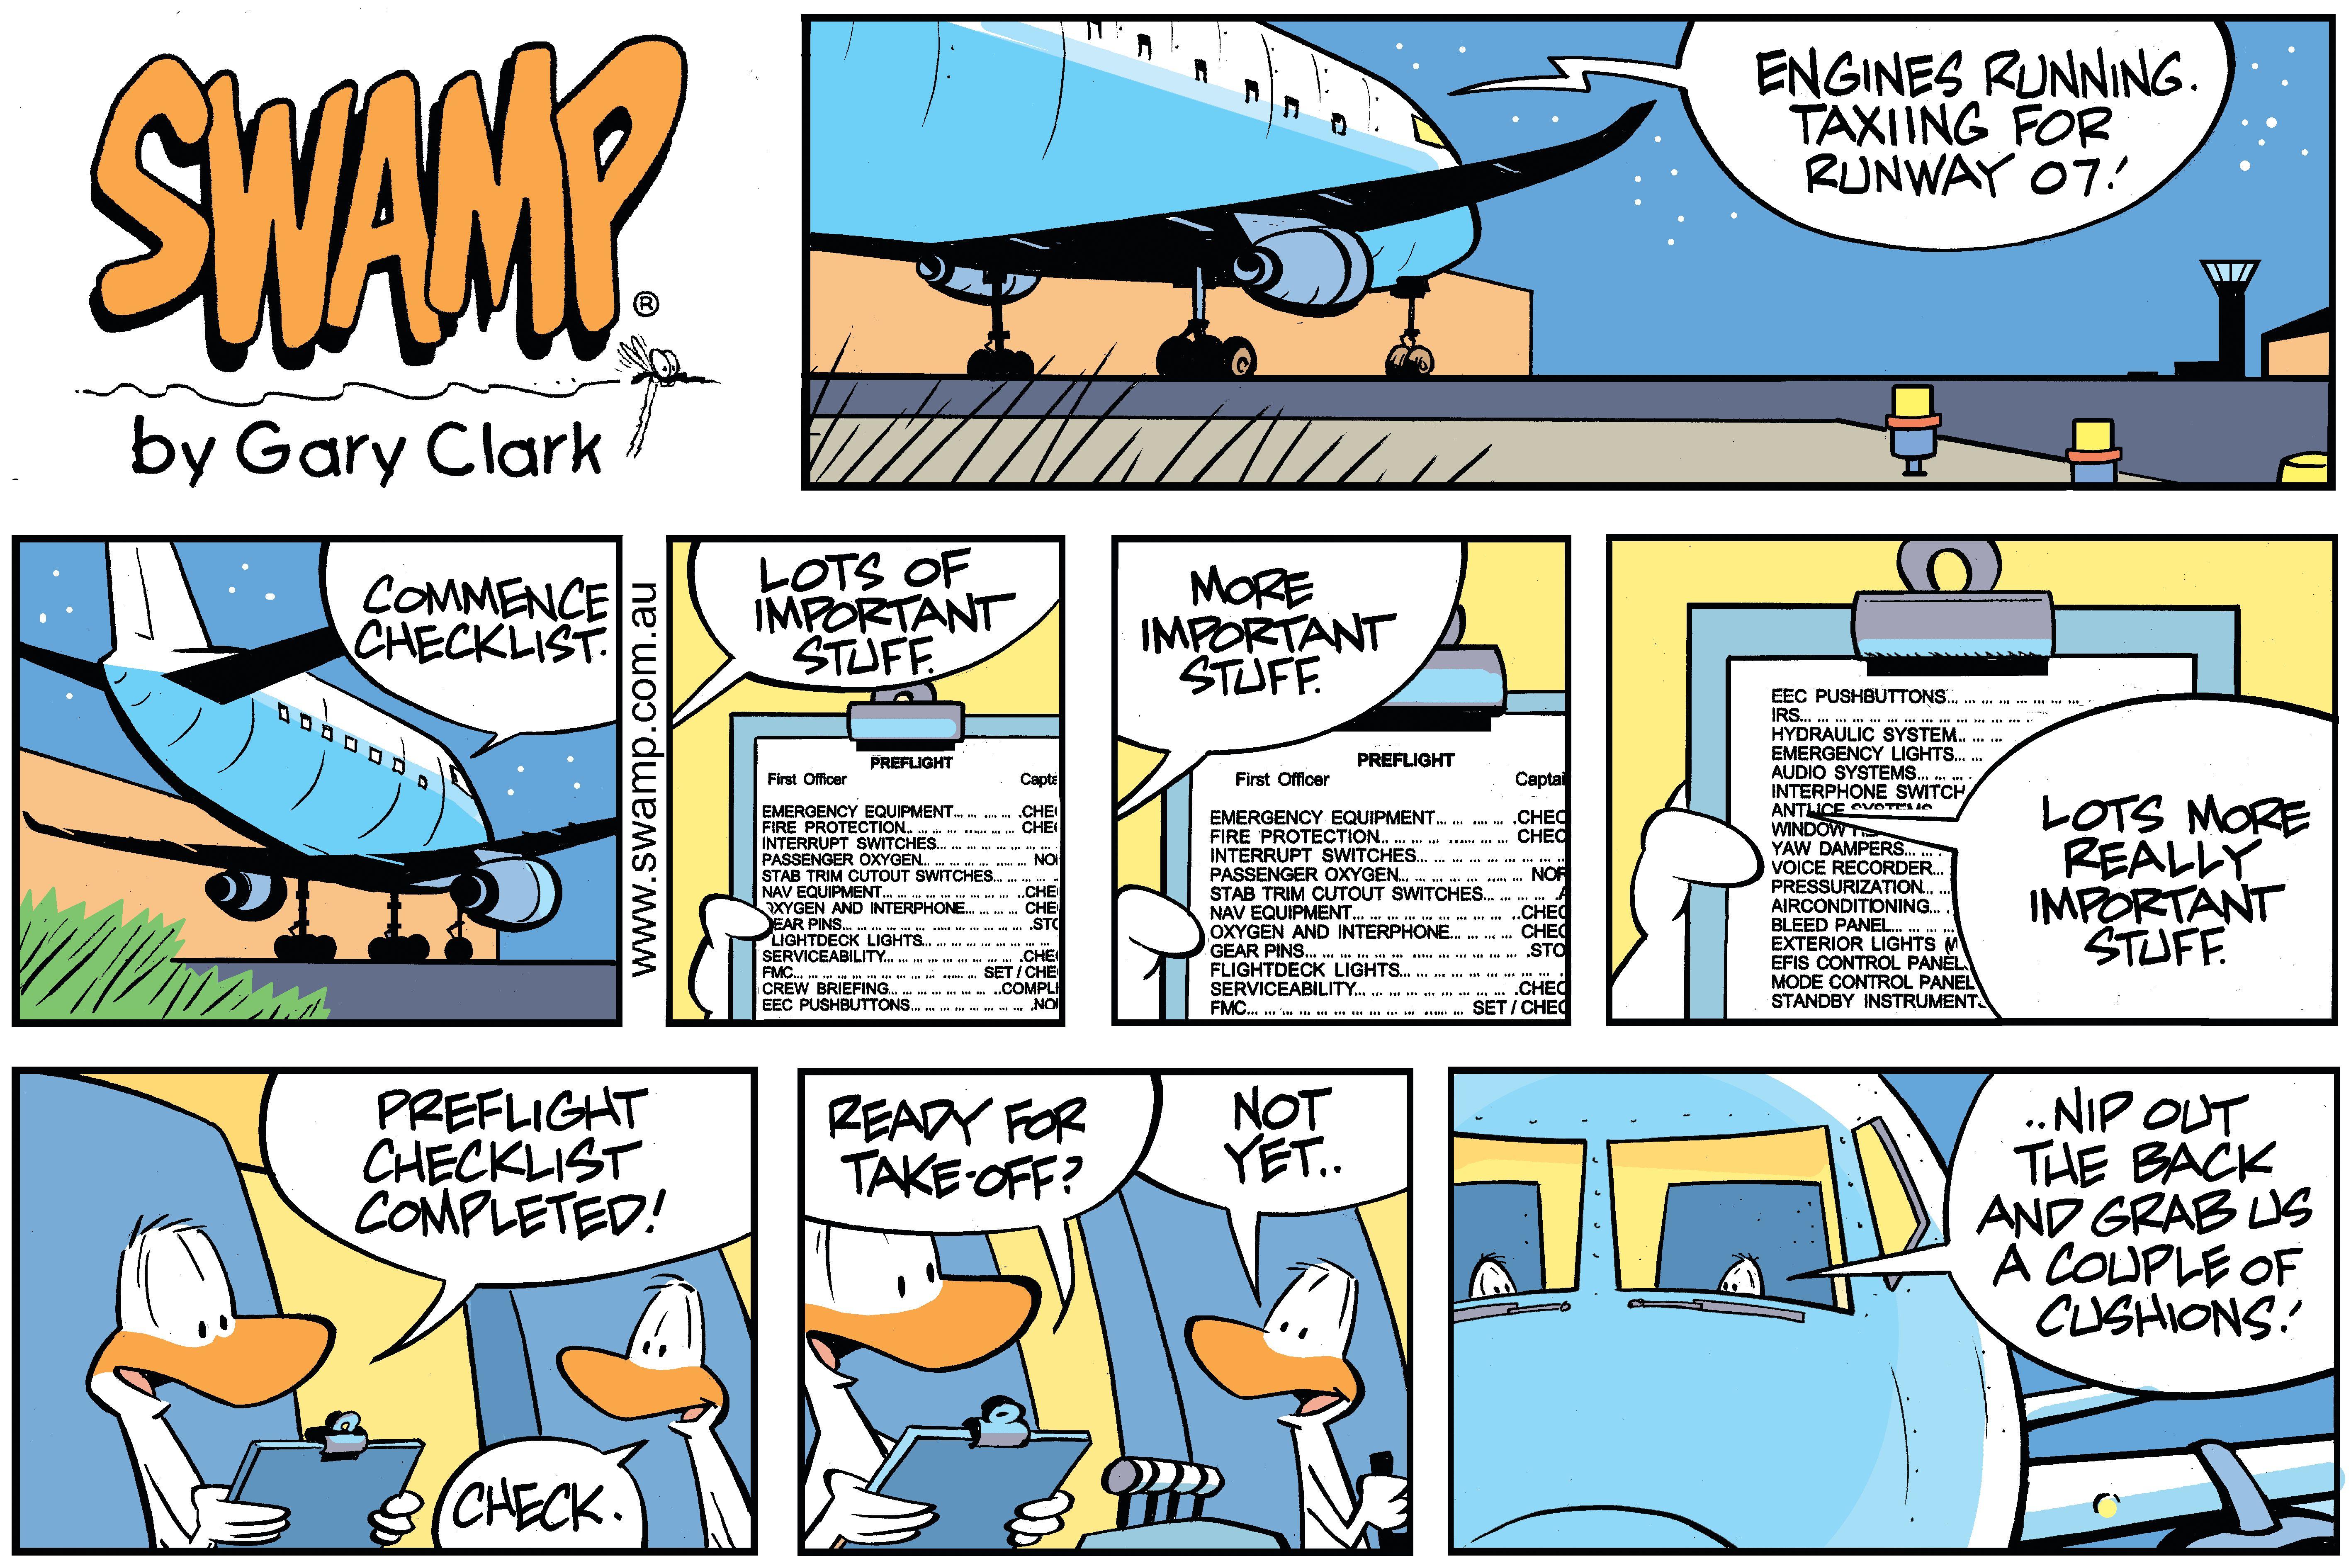 Swamp Ducks Checklist Comic